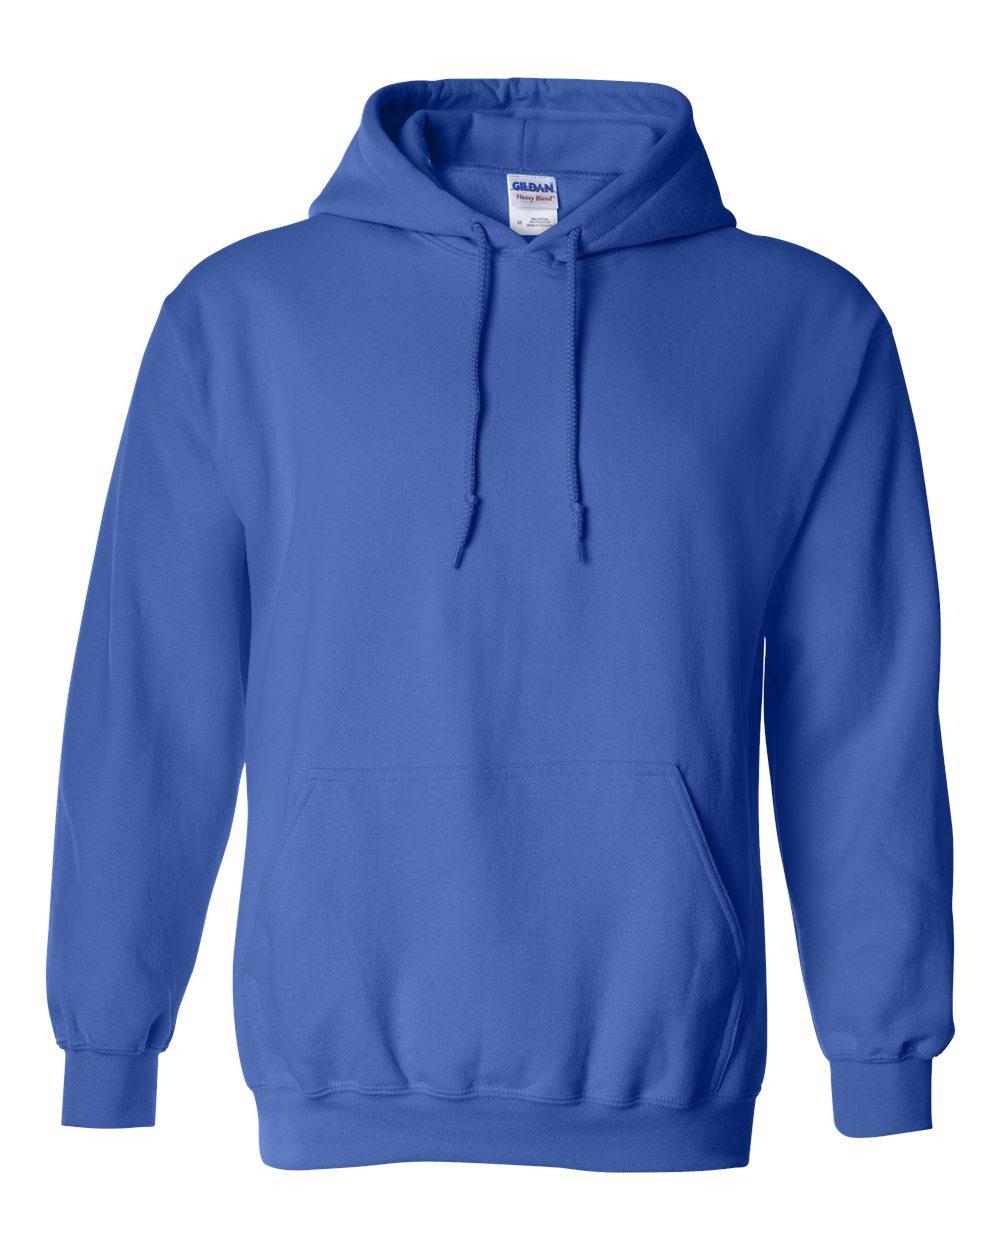 Gildan-Mens-Blank-Hoodie-Heavy-Blend-Hooded-Sweatshirt-Solid-18500-up-to-5XL thumbnail 77